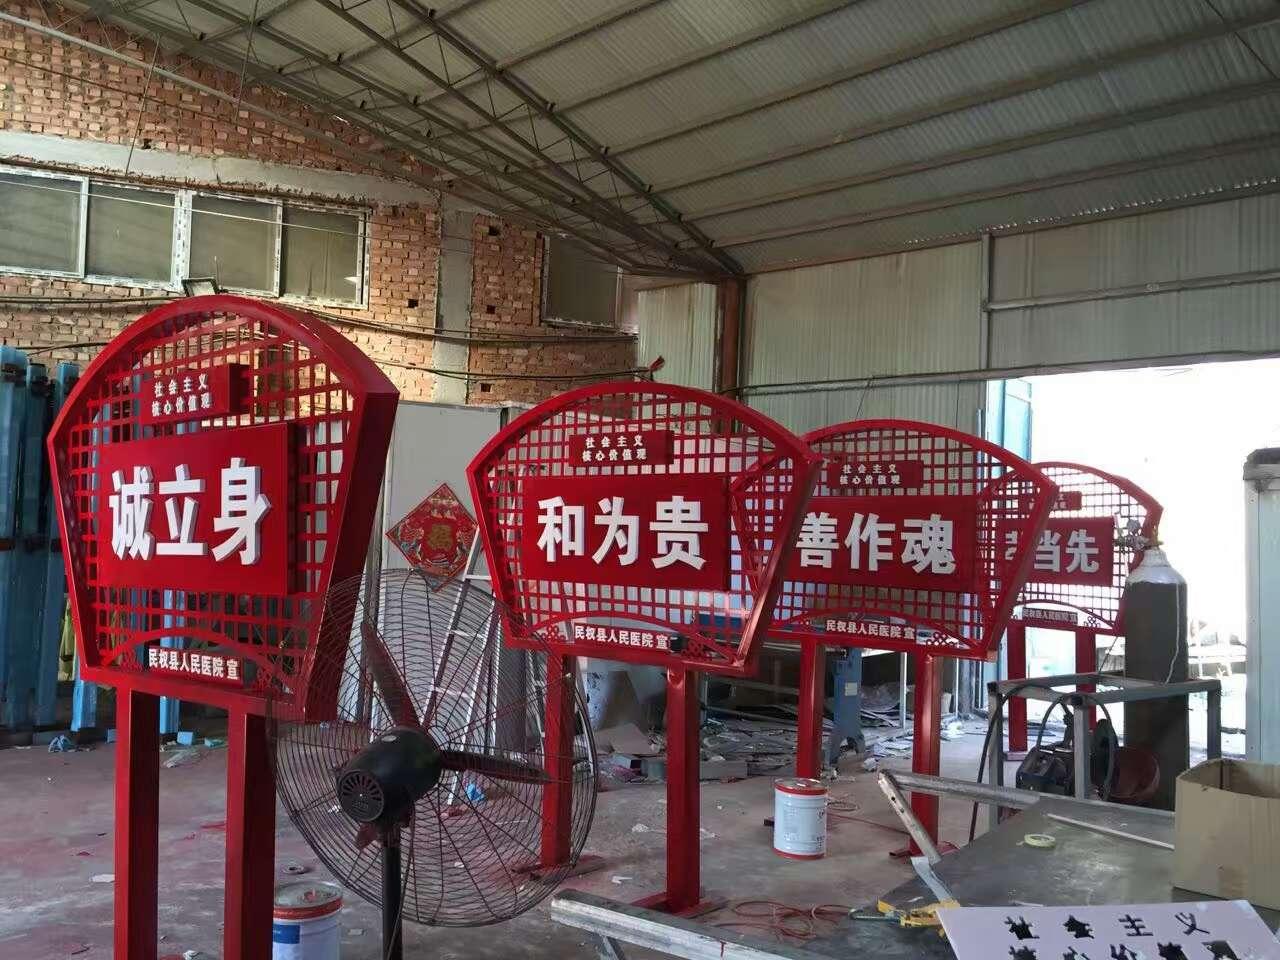 郑州标识标牌厂家|郑州标识标牌